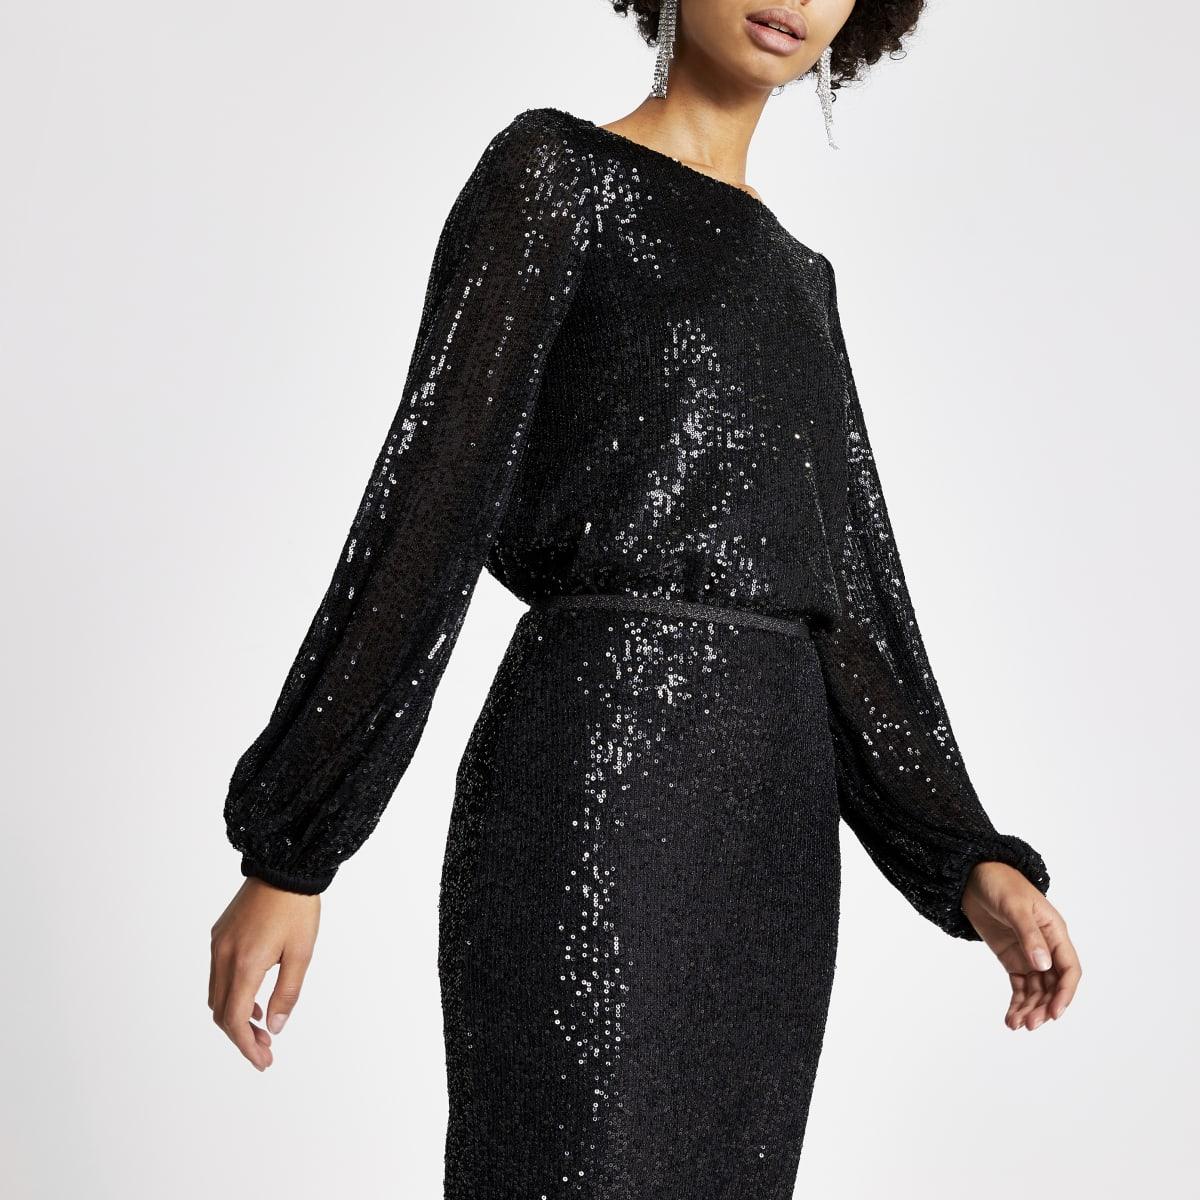 Black sequin long sheer balloon sleeve top